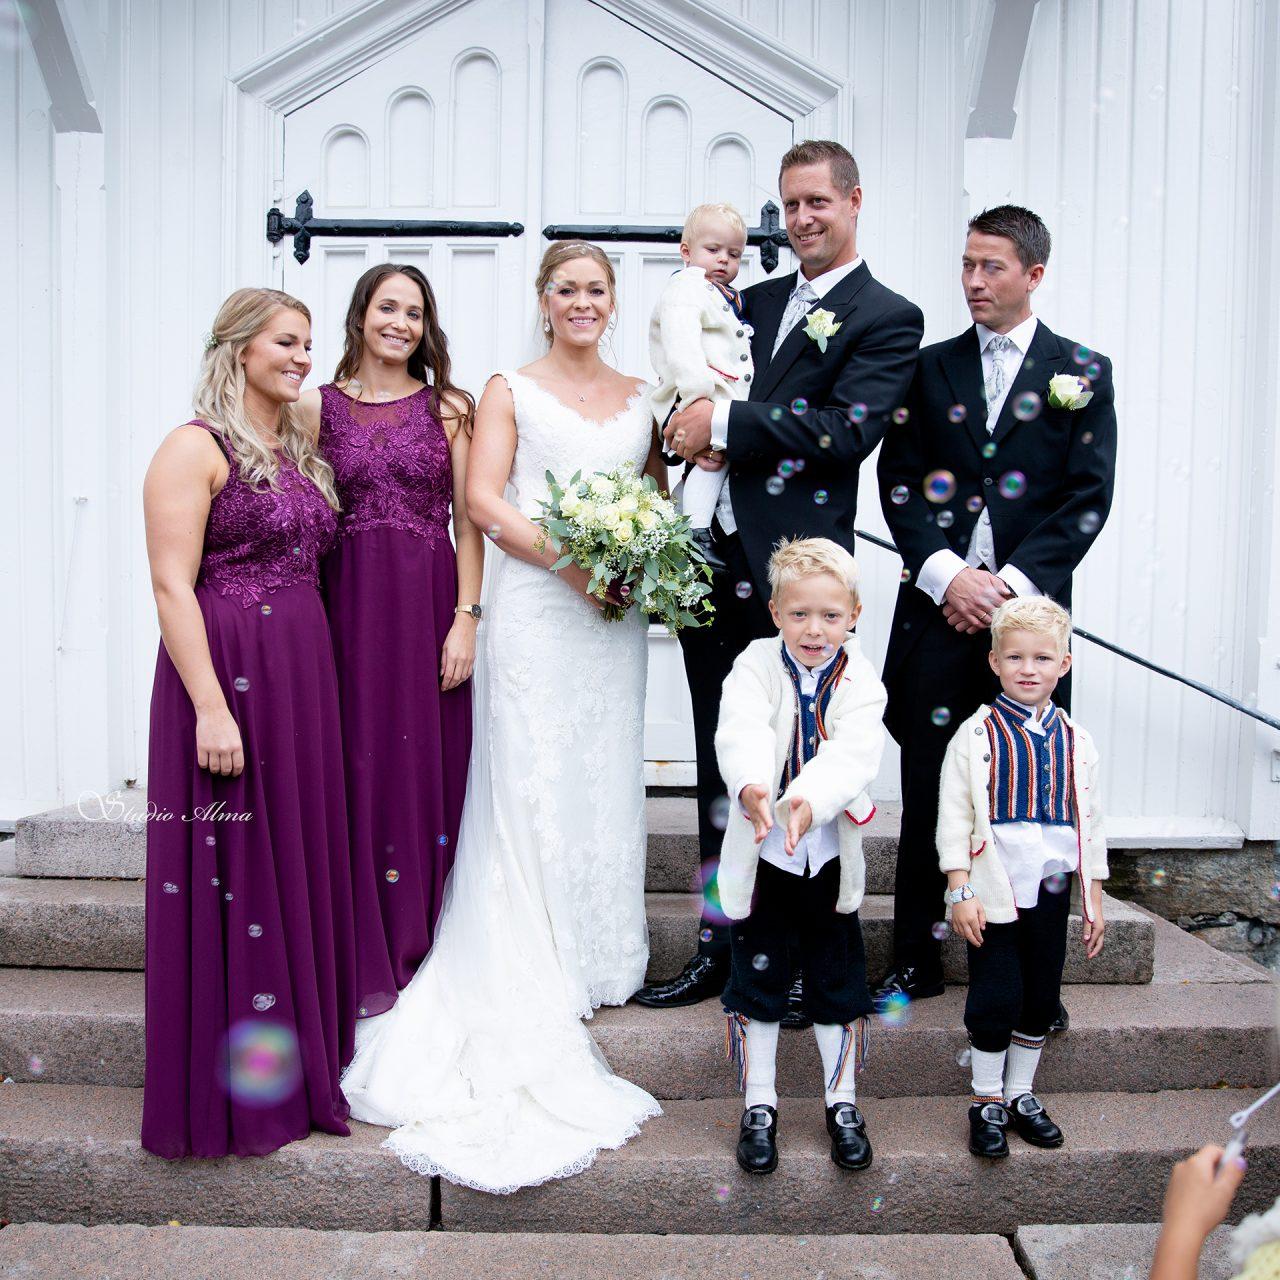 brudepar-forlover-brudesvenner-fotograf-studioalma